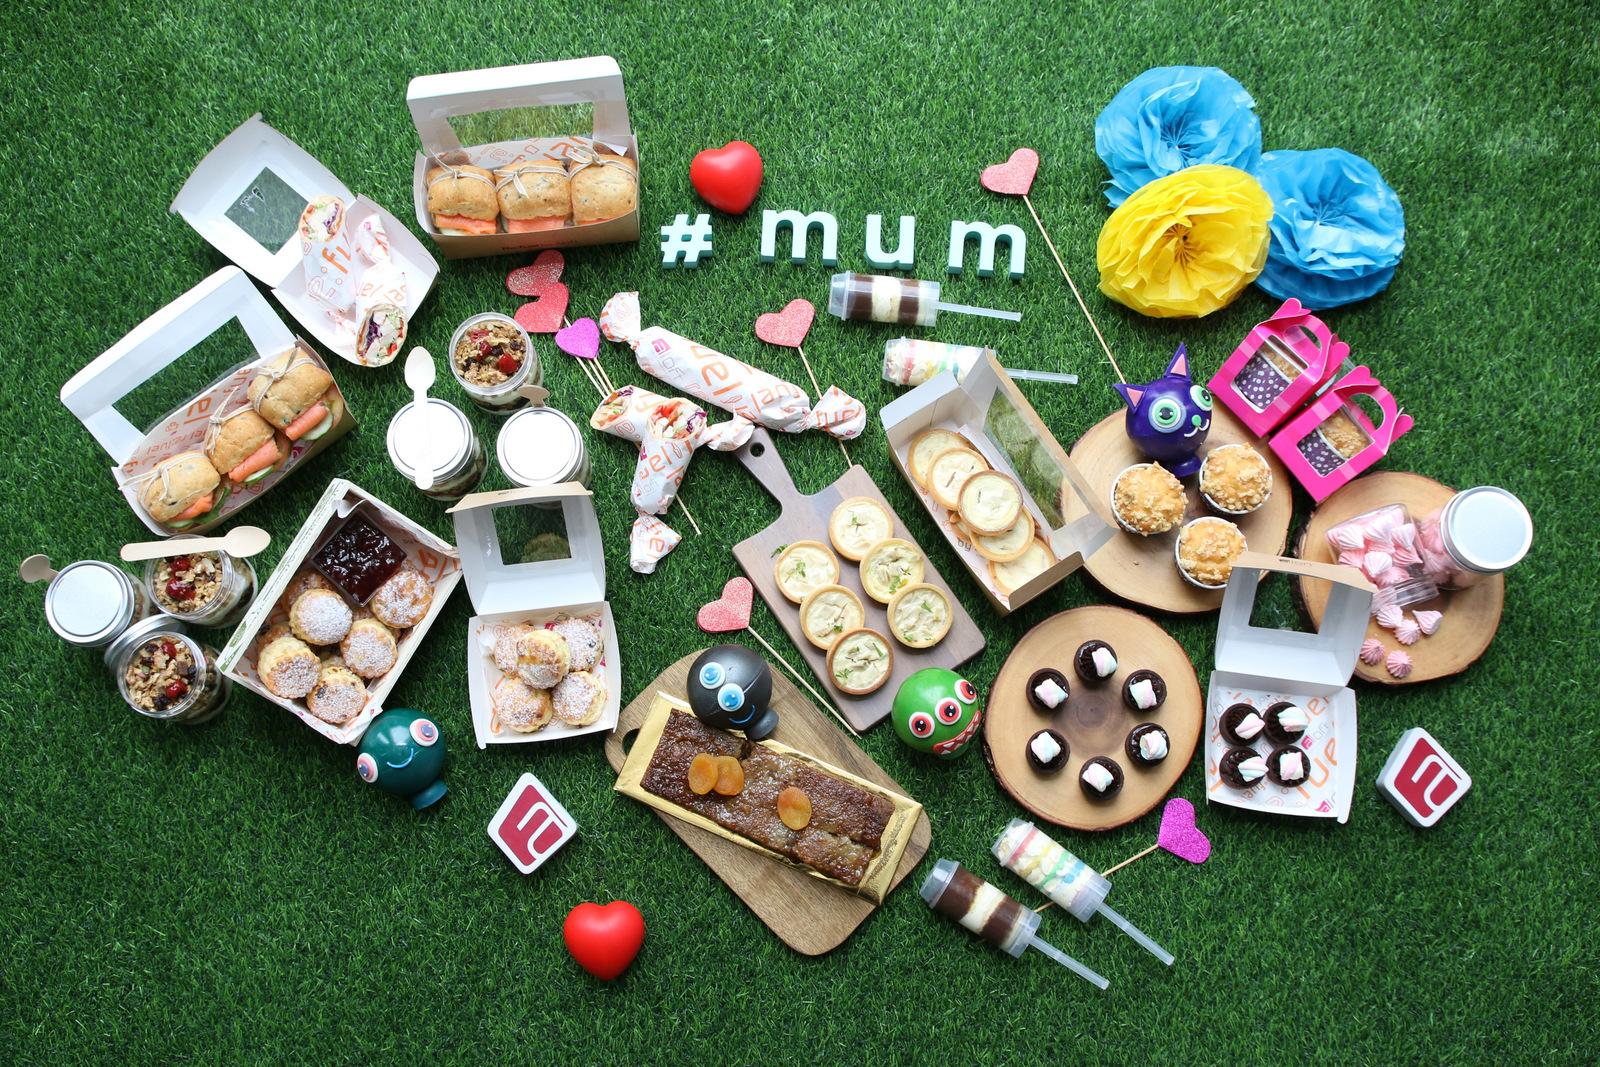 aloft kuala lumpur sentral: rewarding mum with a week of feasting